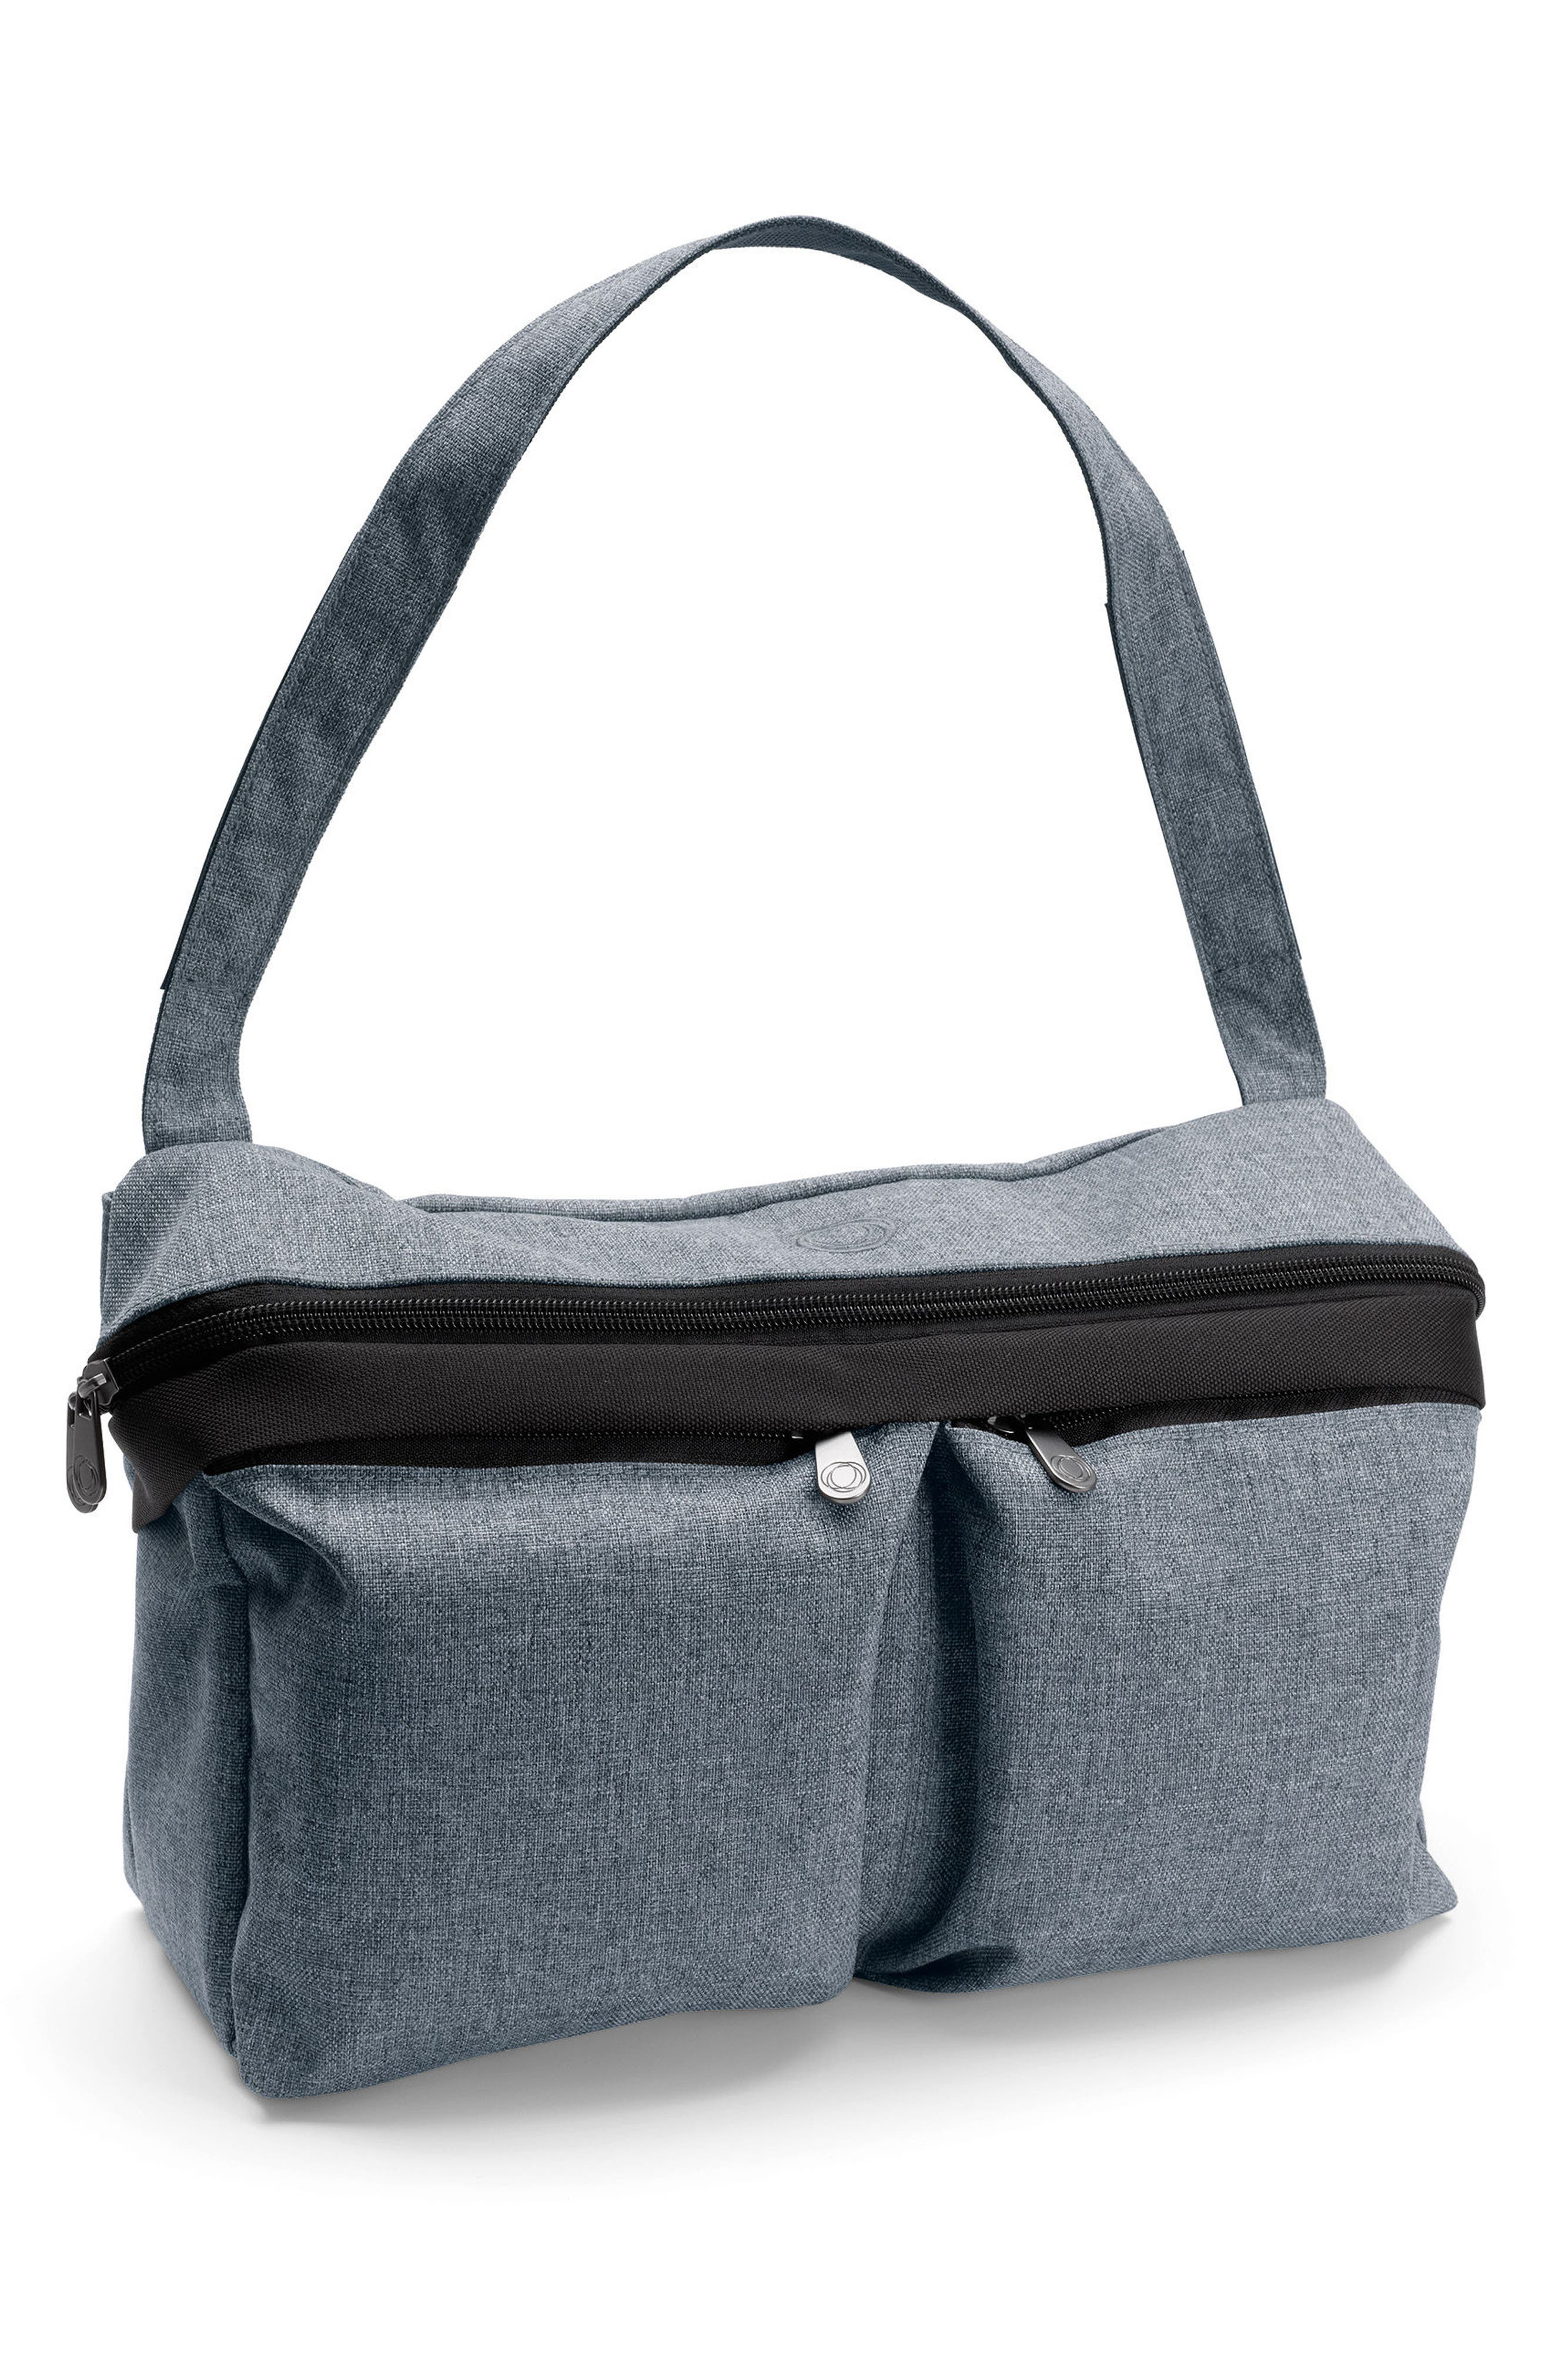 Main Image - Bugaboo Stroller Organizer Bag